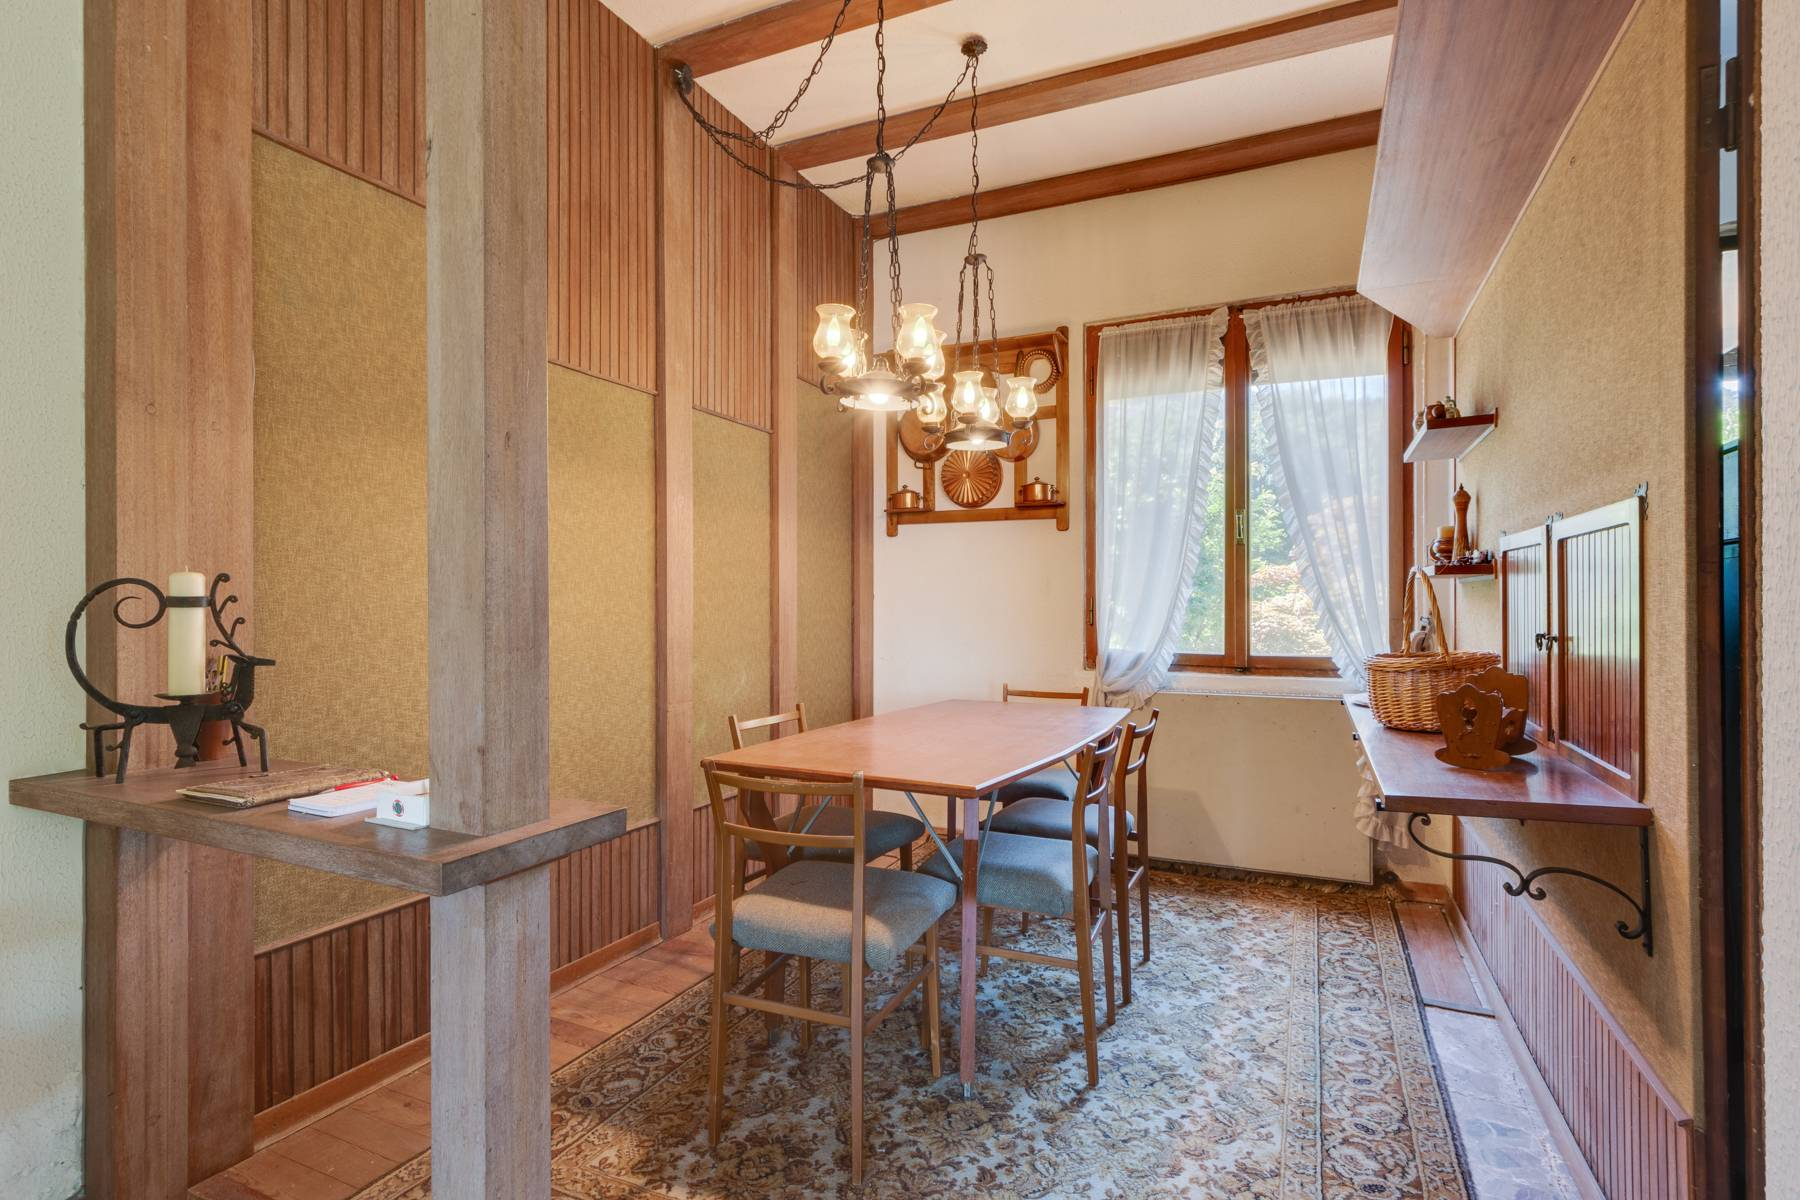 Villa in Vendita a Stresa: 5 locali, 150 mq - Foto 11